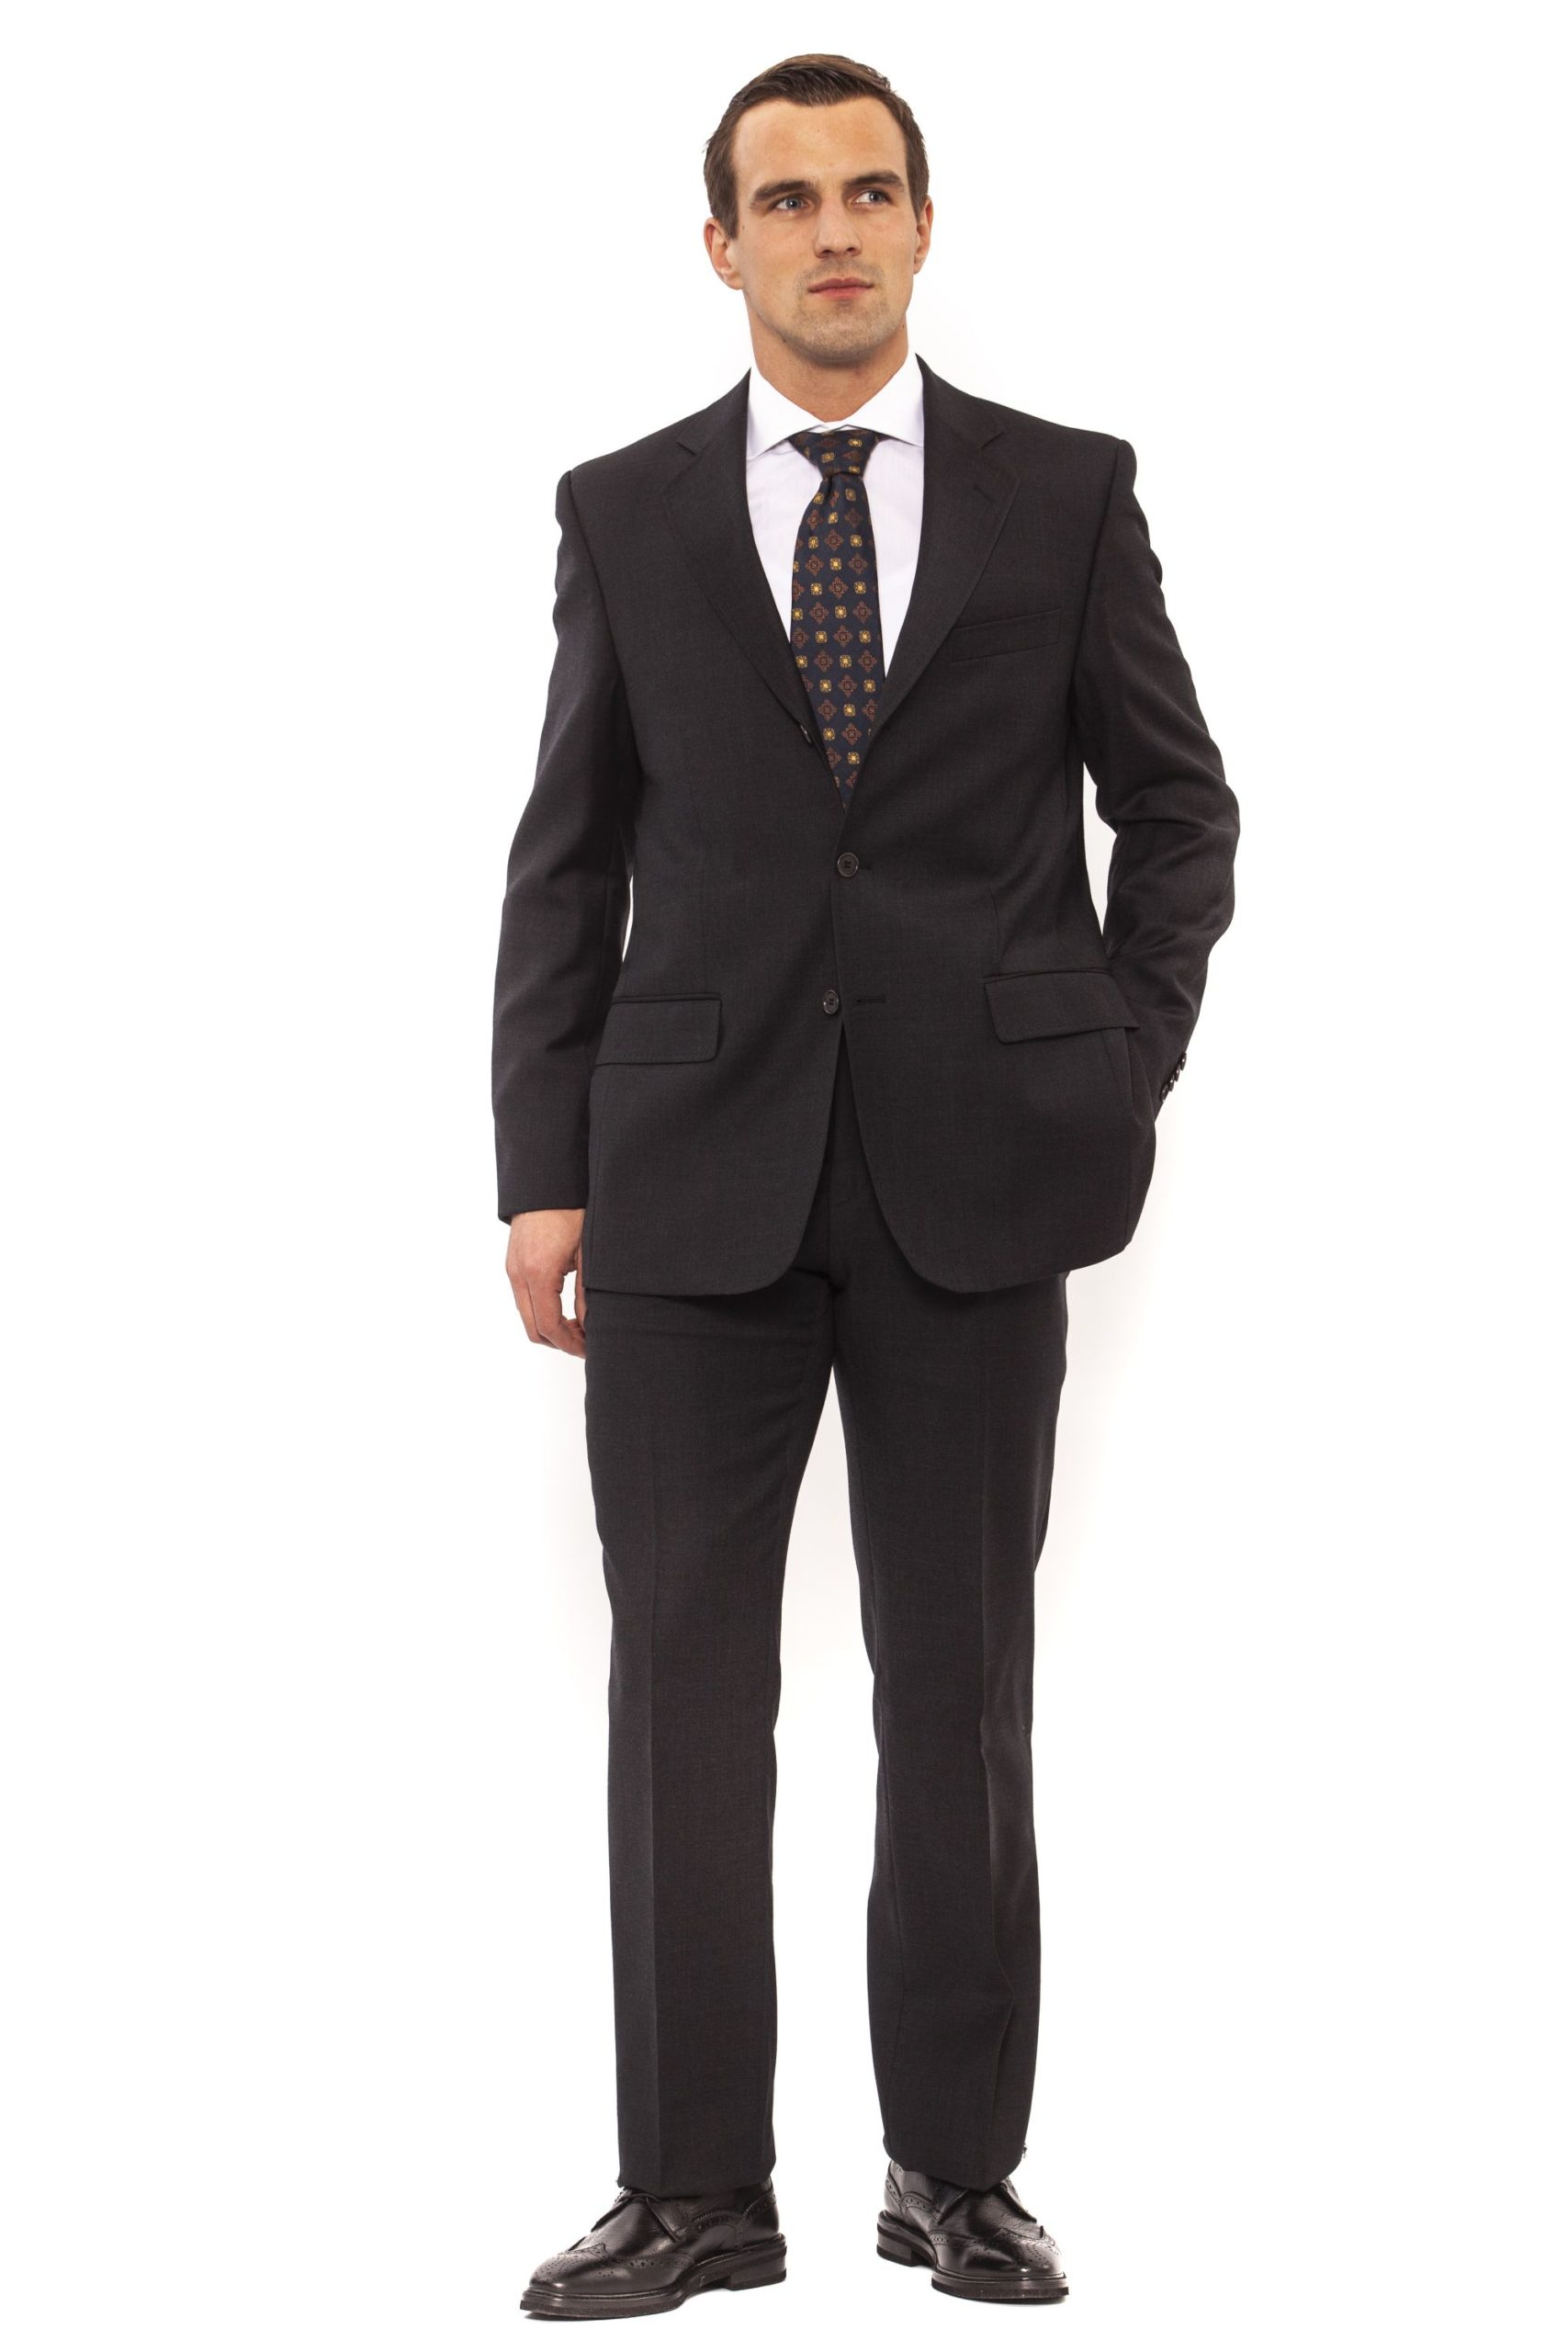 Ferre Men's Clothing Anthracite Suit Gray FE991812 - IT50 | L